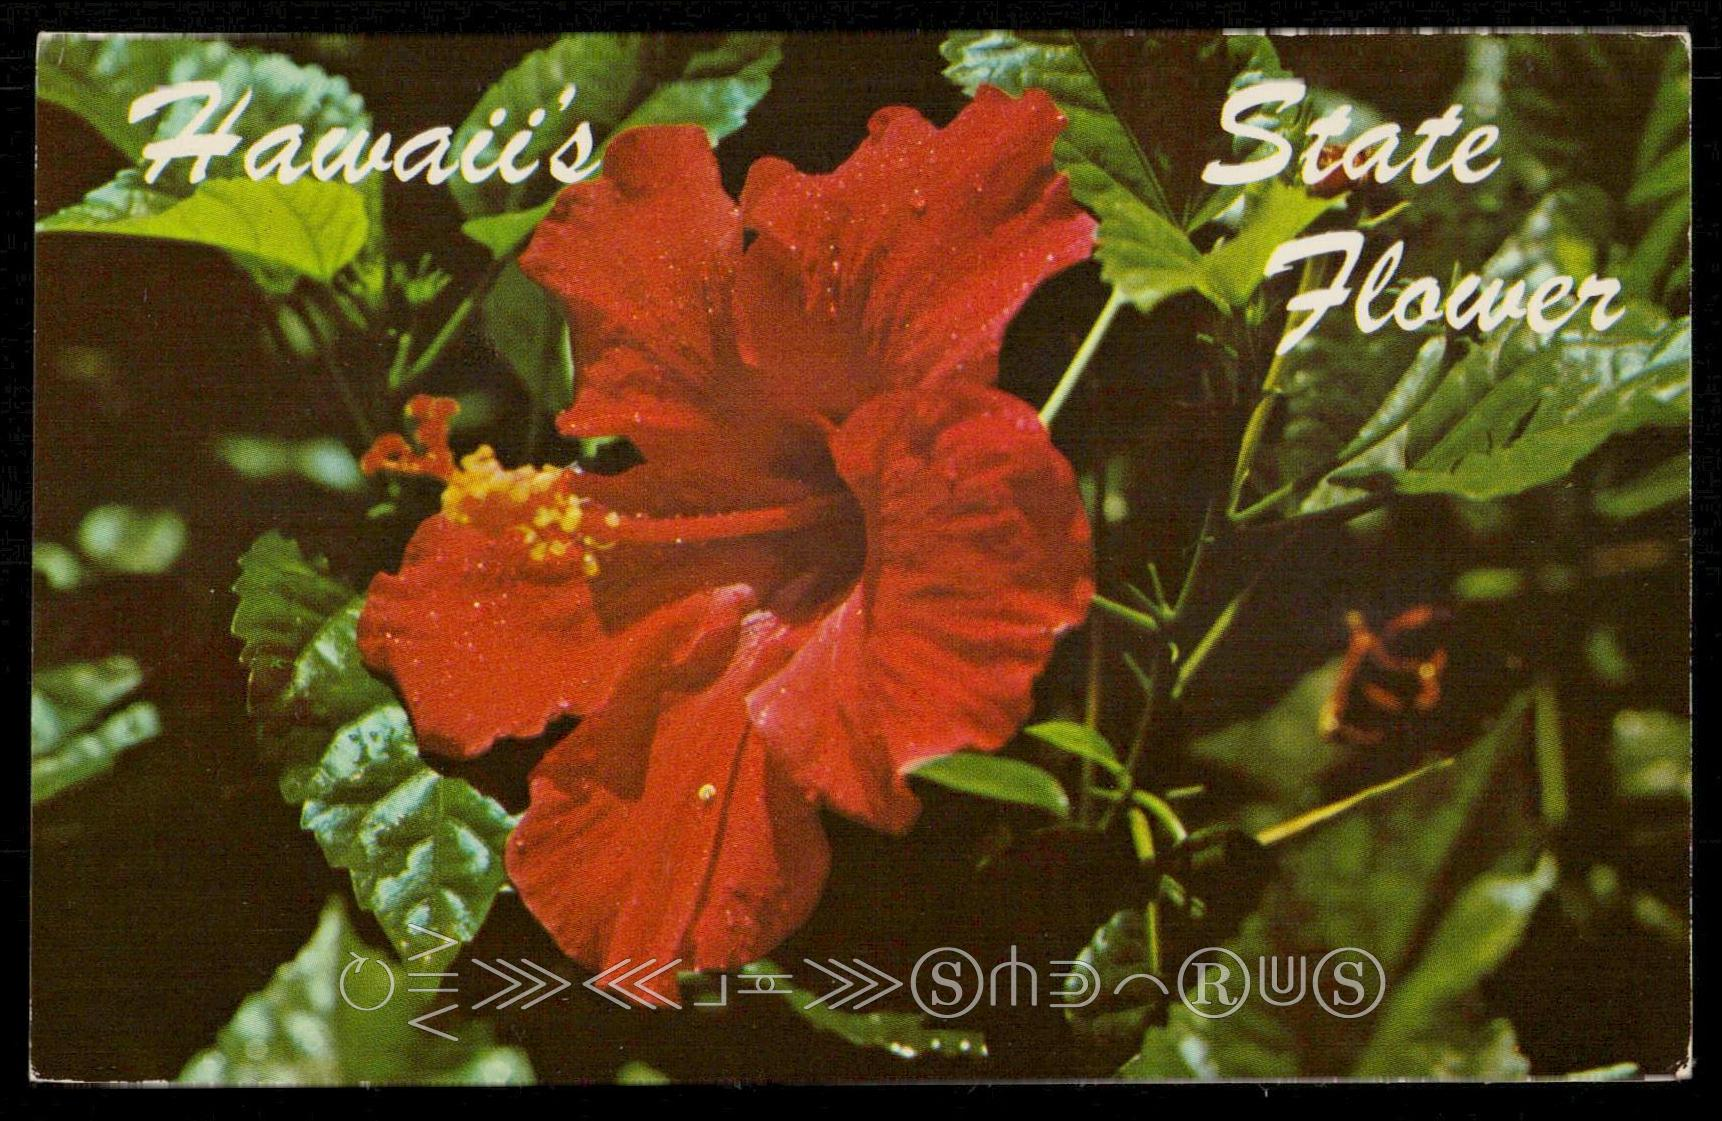 Red hibiscus hawaii state flower hippostcard listing izmirmasajfo